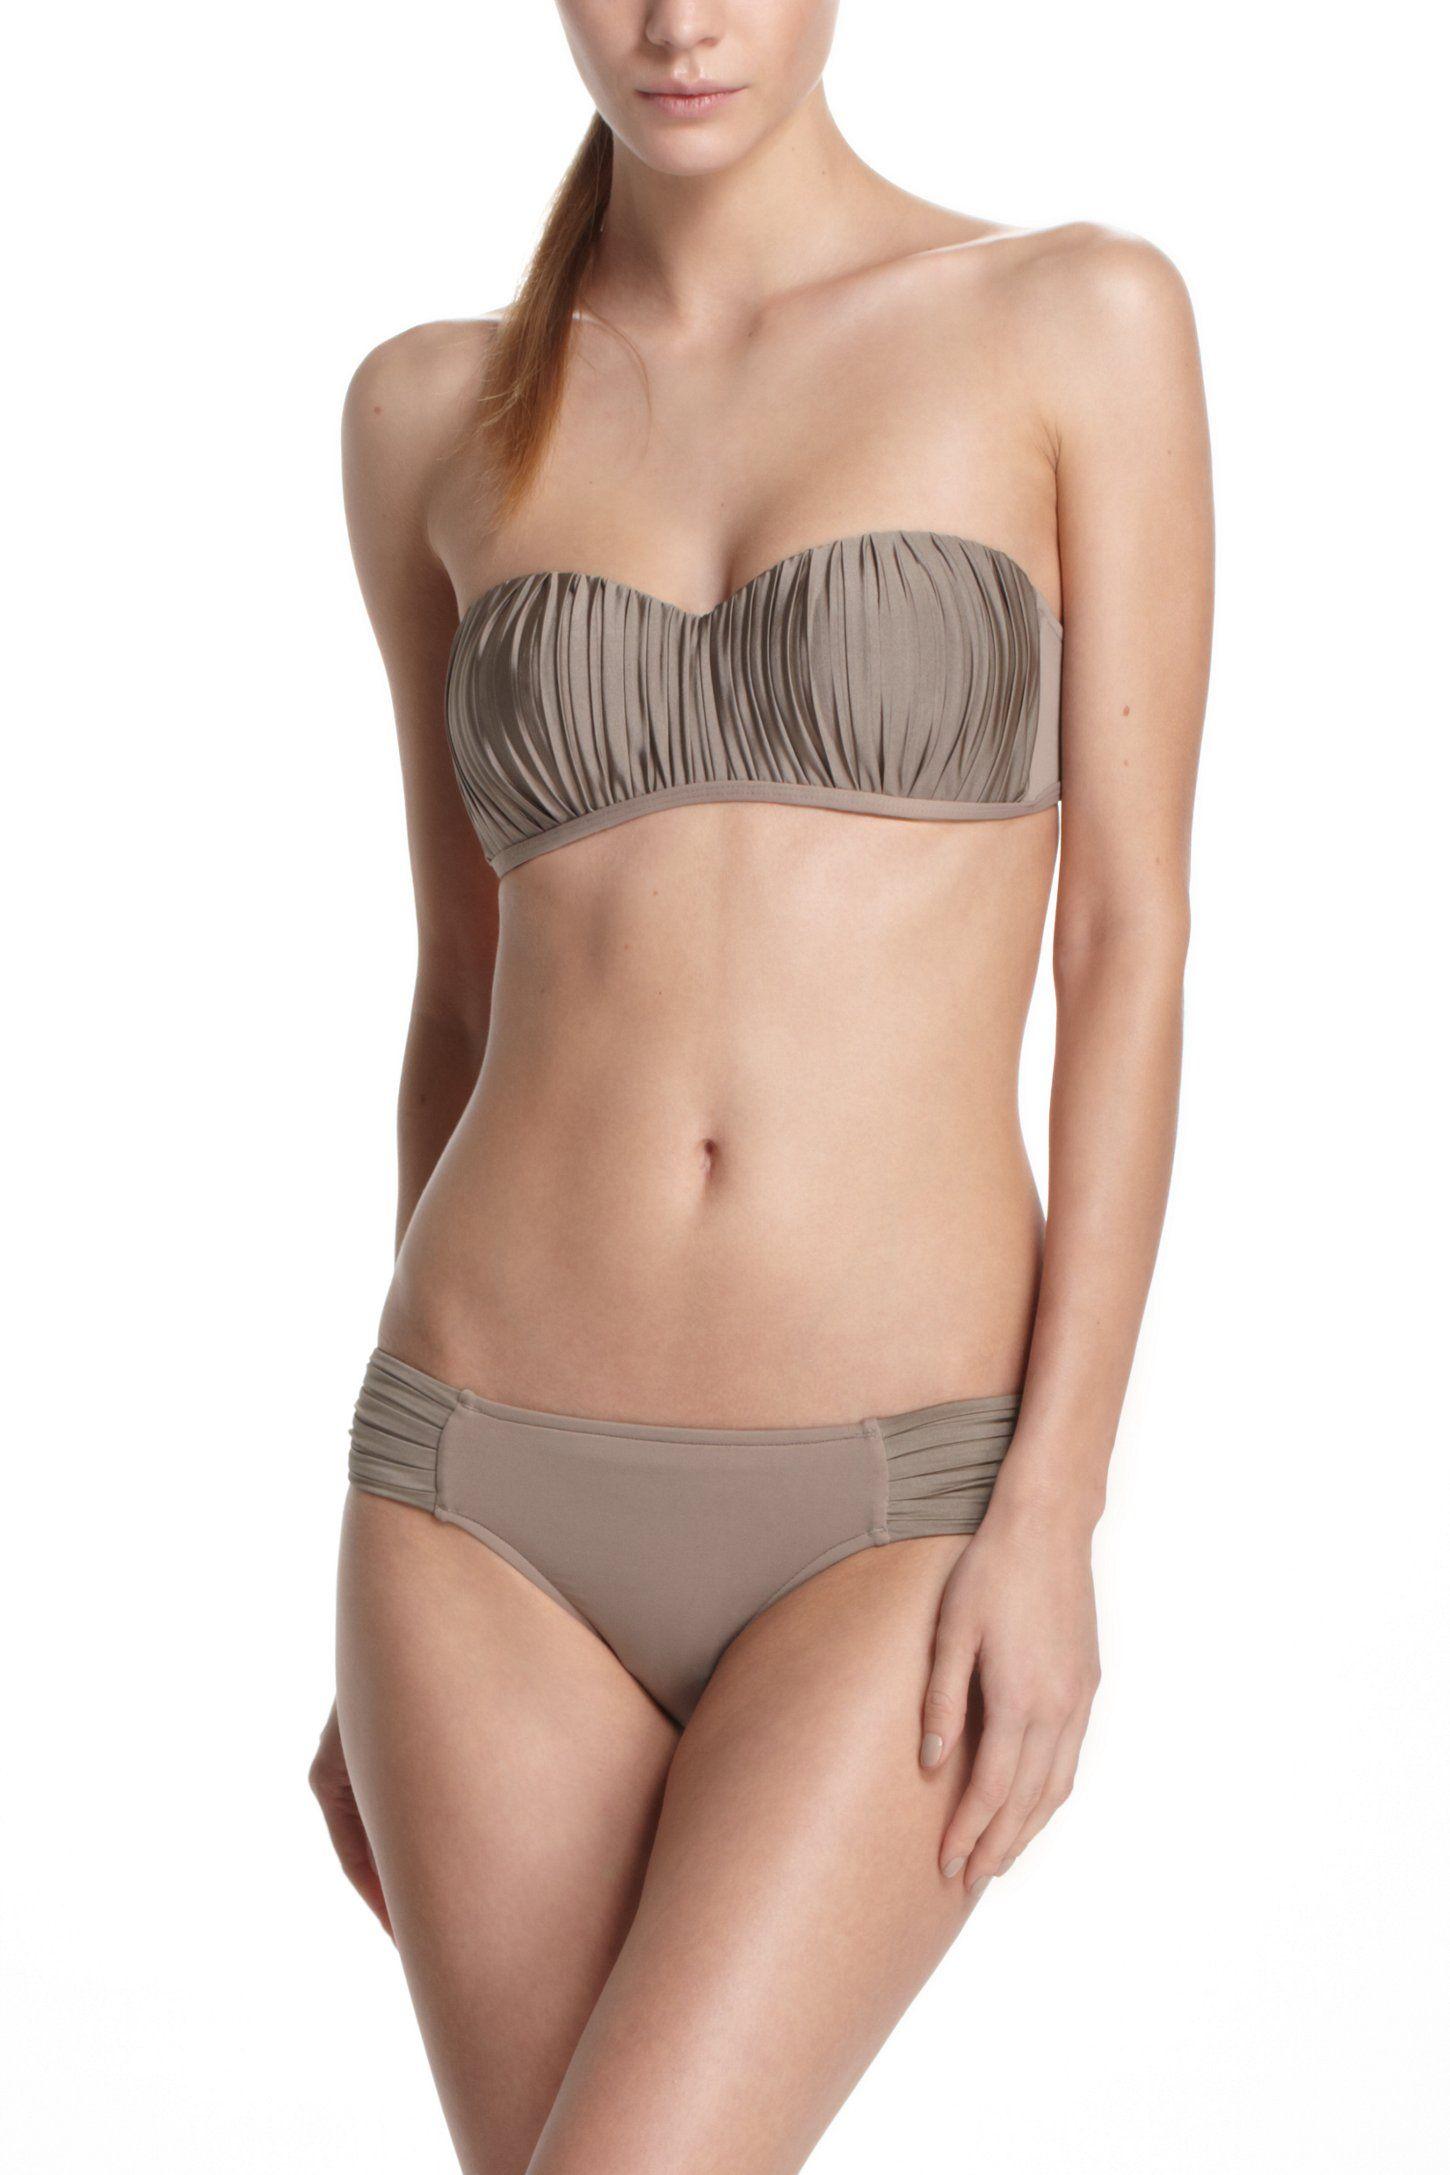 Seafolly Goddess Kiara Bikini Bottoms - Anthropologie.com